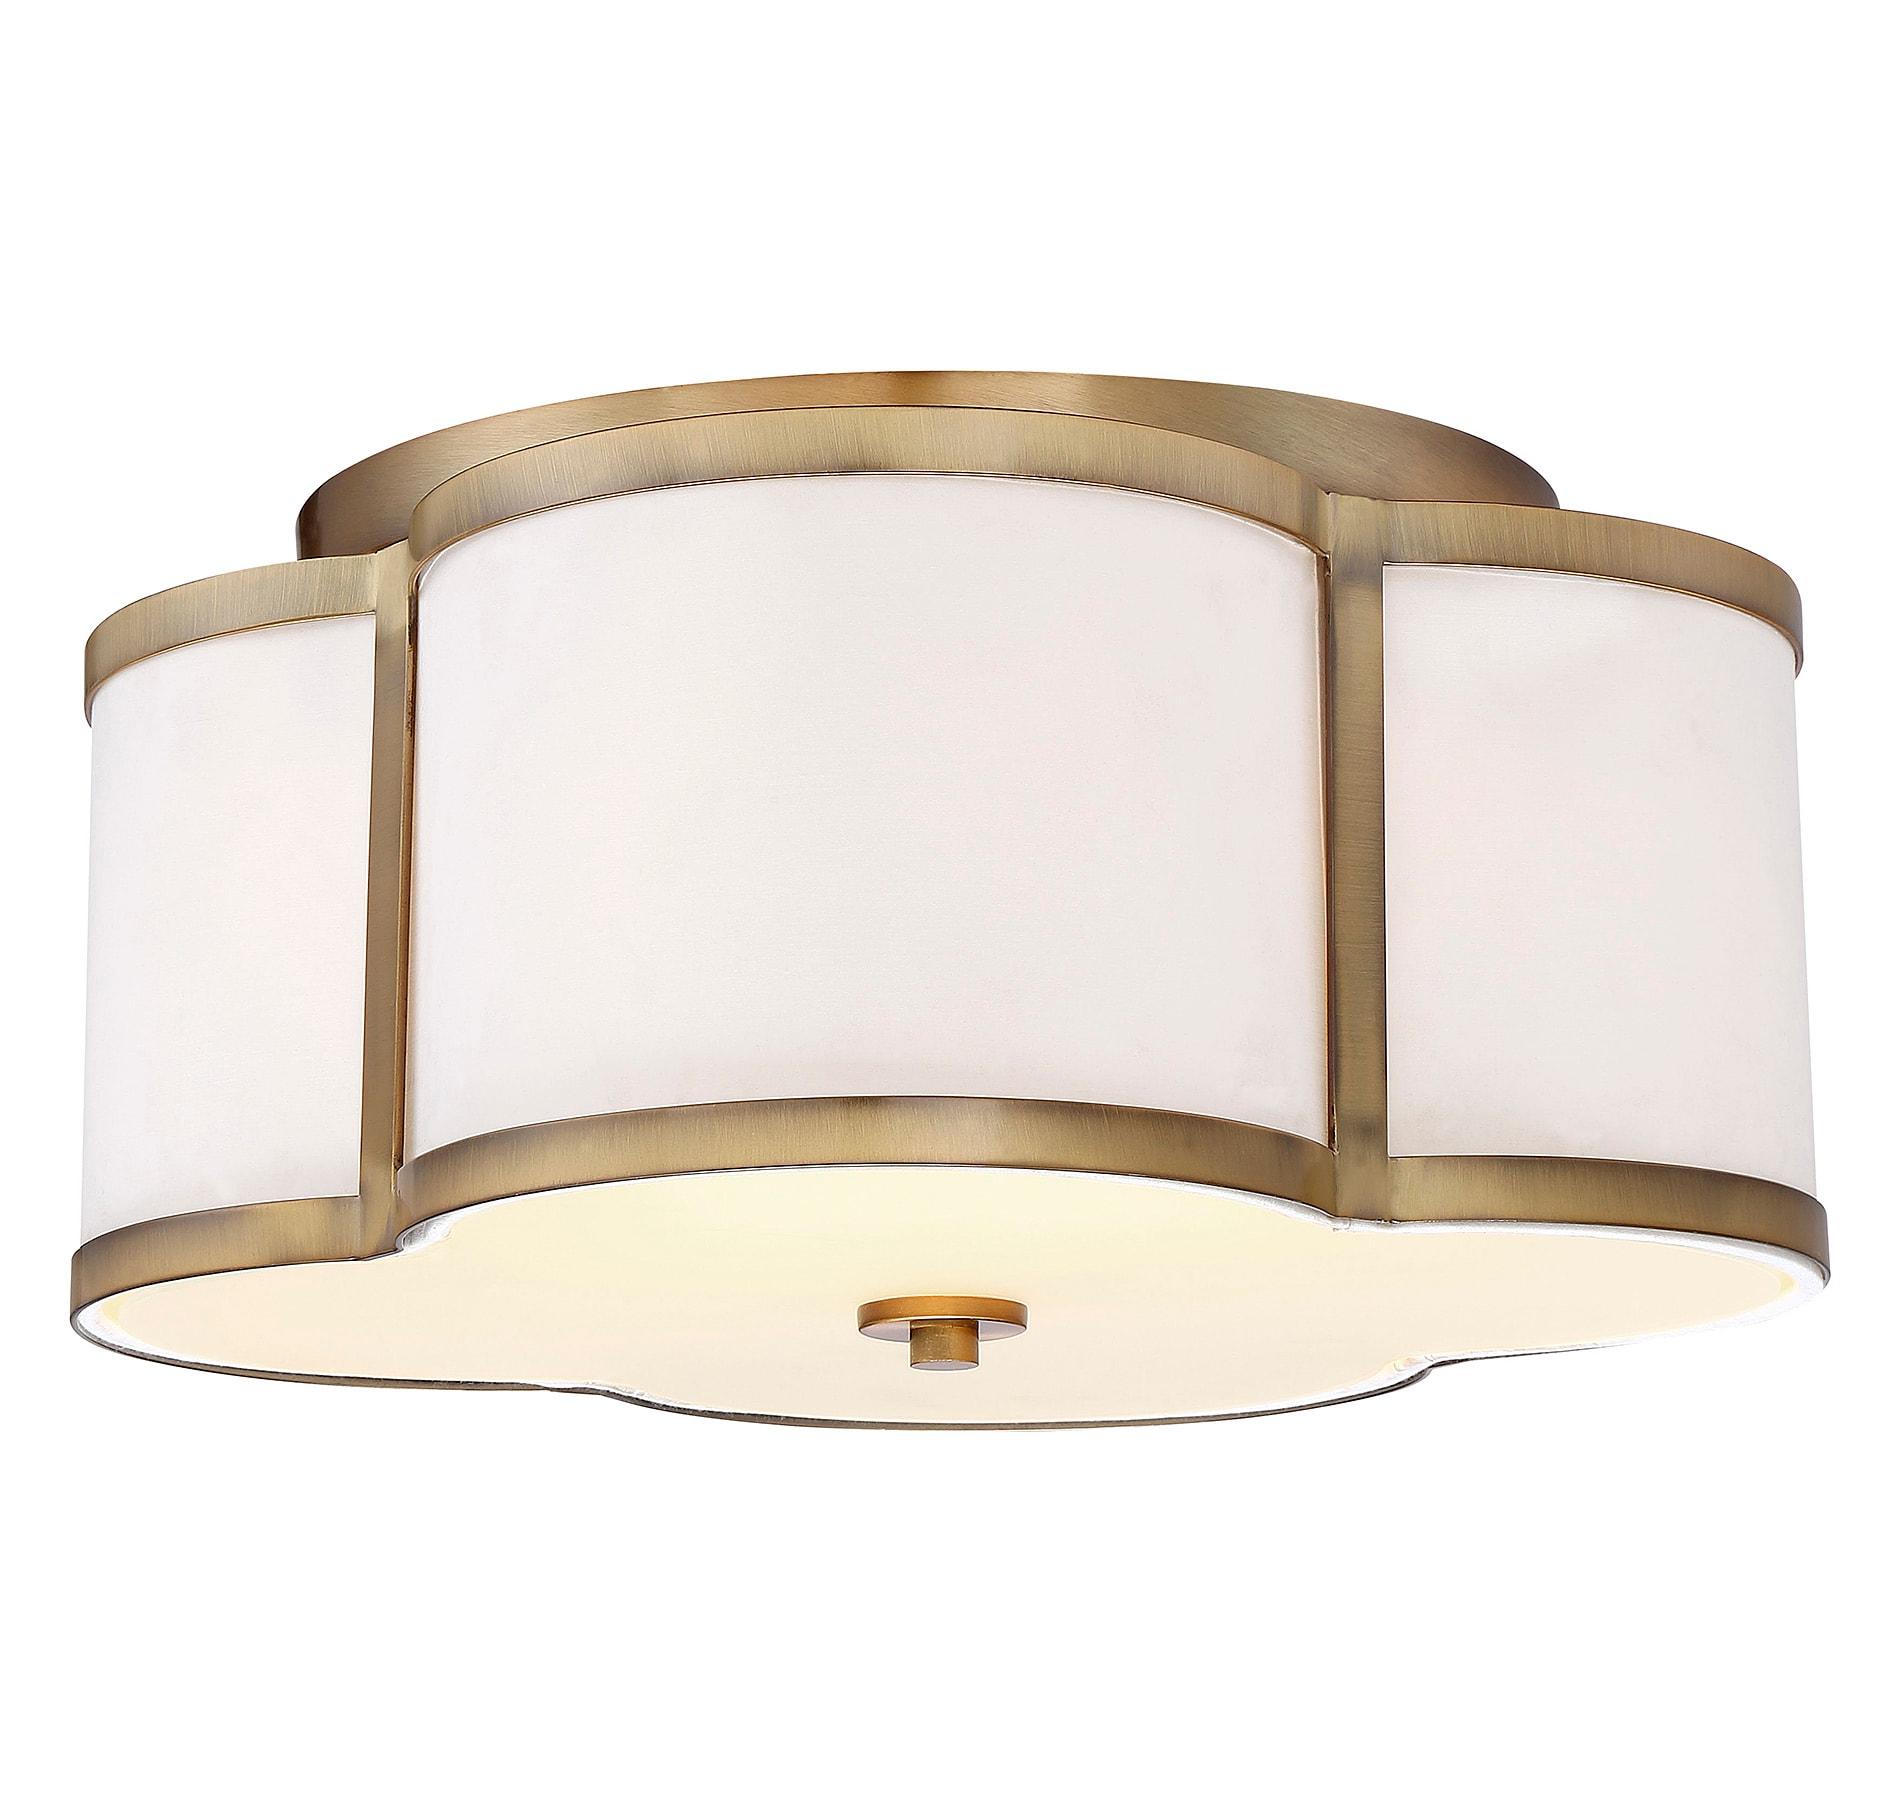 Bellevue Sh60020nb Natural Brass 3 Light 16 Wide Flush Mount Drum Ceiling Fixture Lightingdirect Com